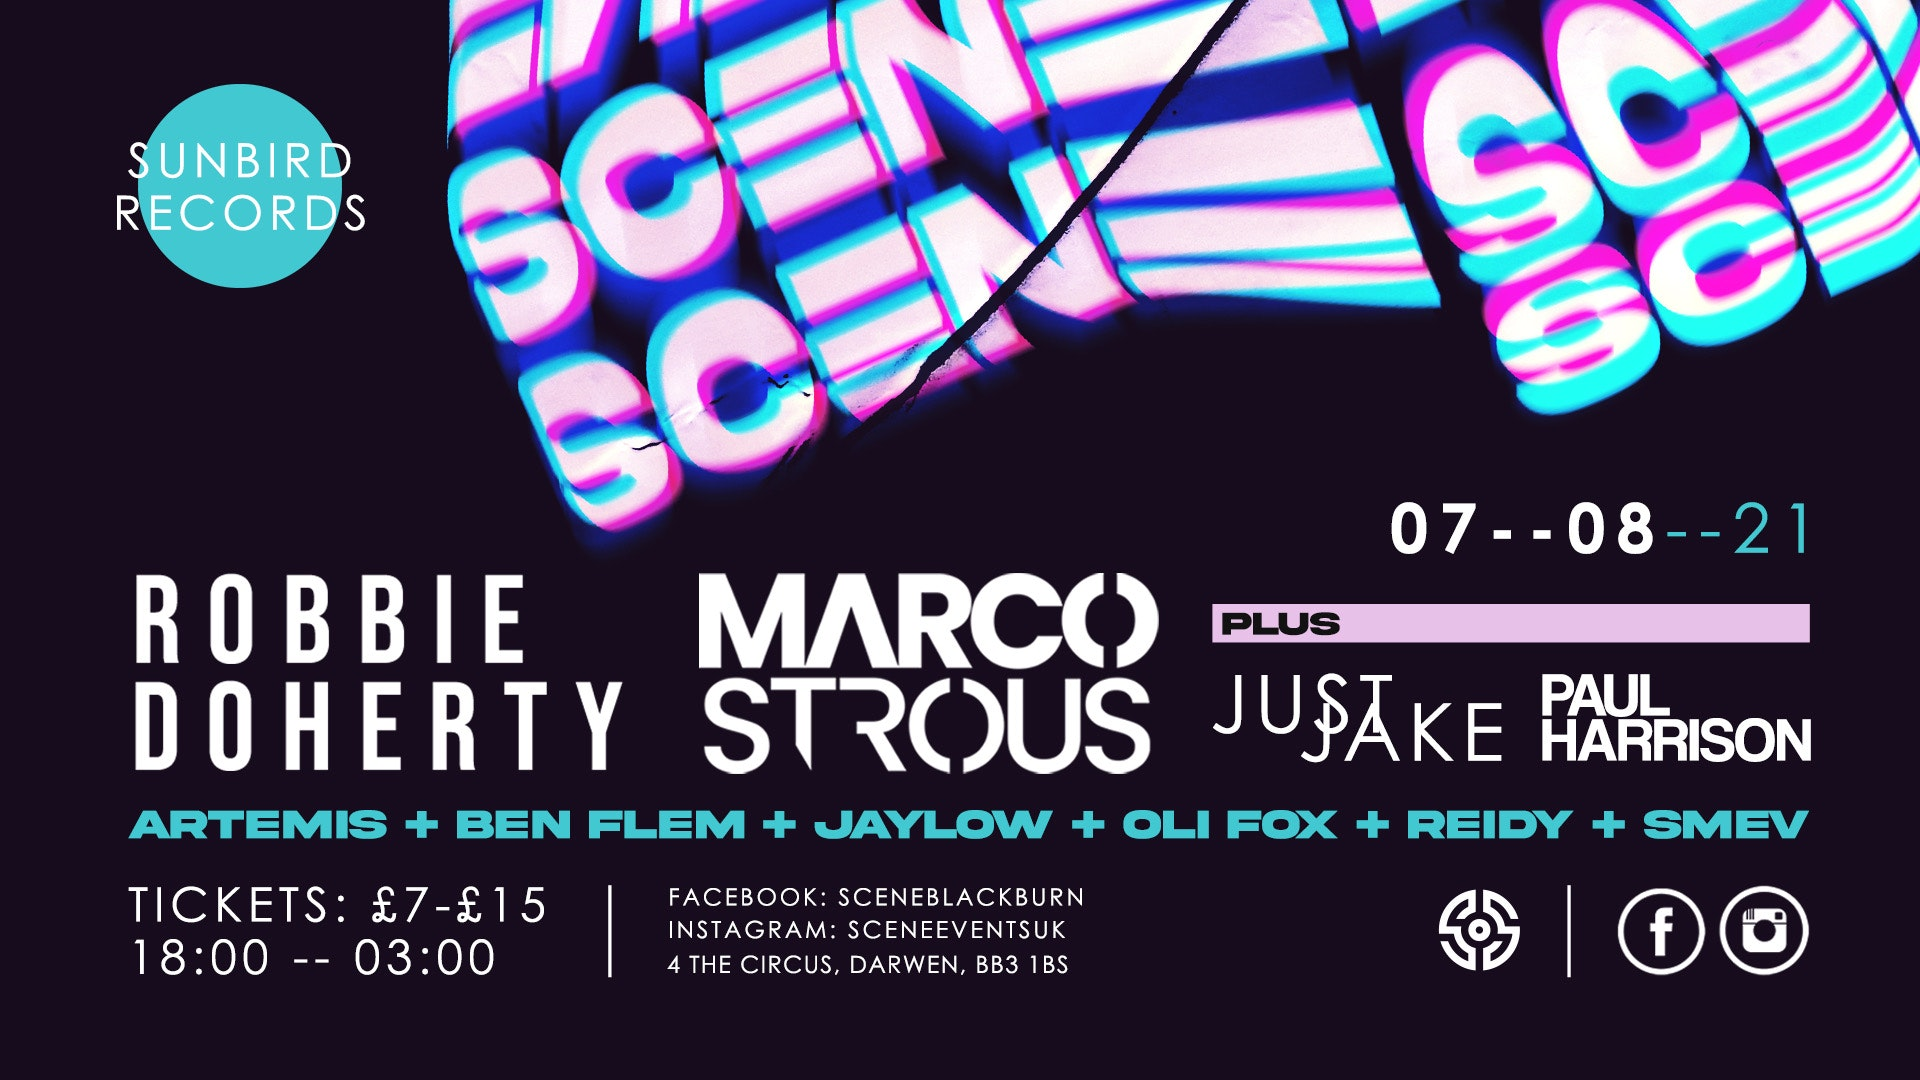 Scene Presents: ROBBIE DOHERTY + MARCO STROUS w/ Just Jake, Paul Harrison & More